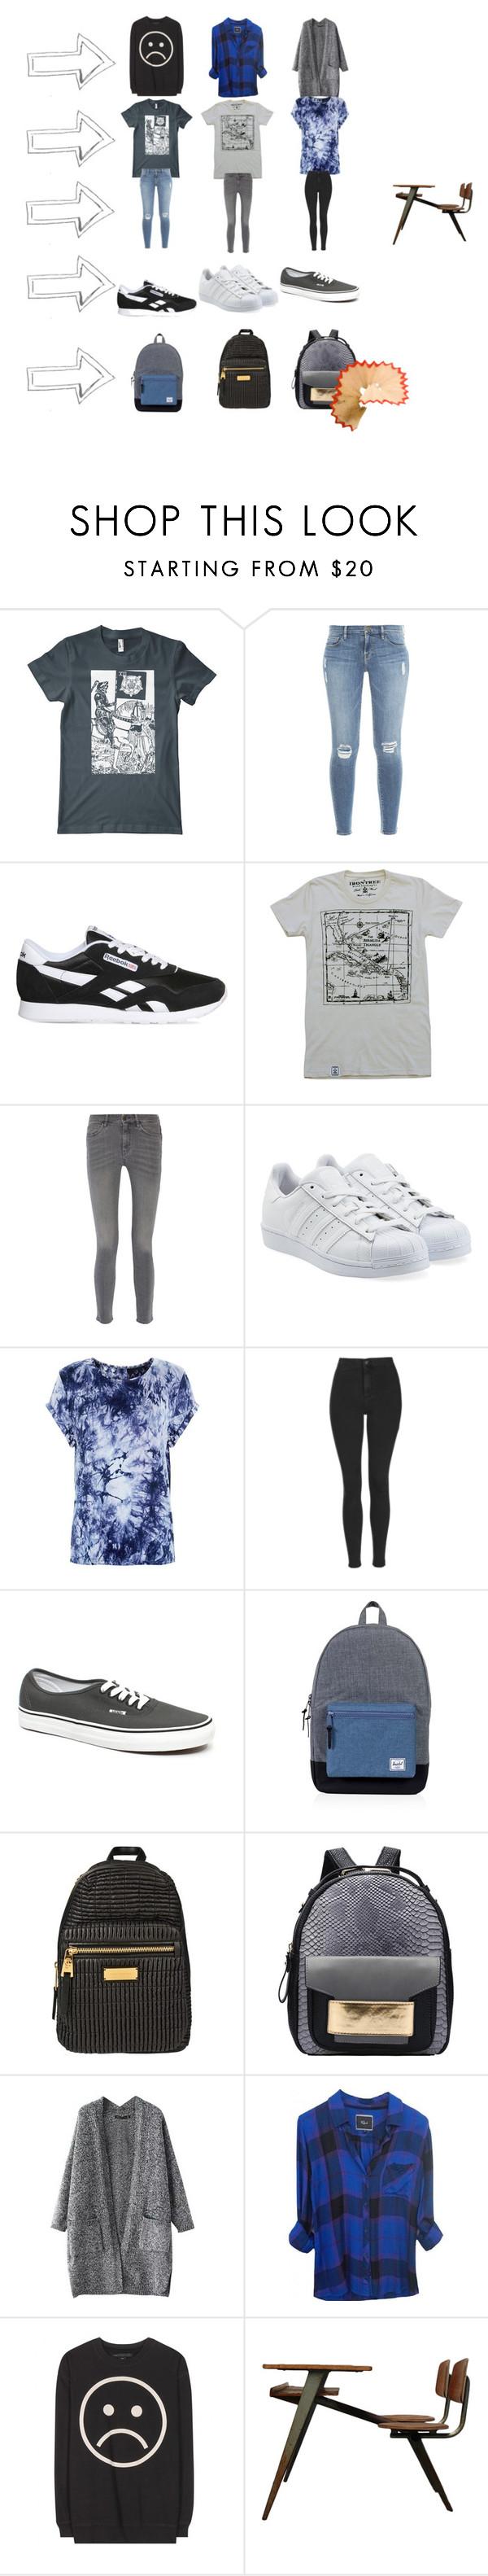 """Avg. School Uniform"" by adiaz064 on Polyvore featuring American Apparel, Frame Denim, Reebok, MiH Jeans, adidas Originals, Parisian, Topshop, Vans, Herschel Supply Co. and Juicy Couture"